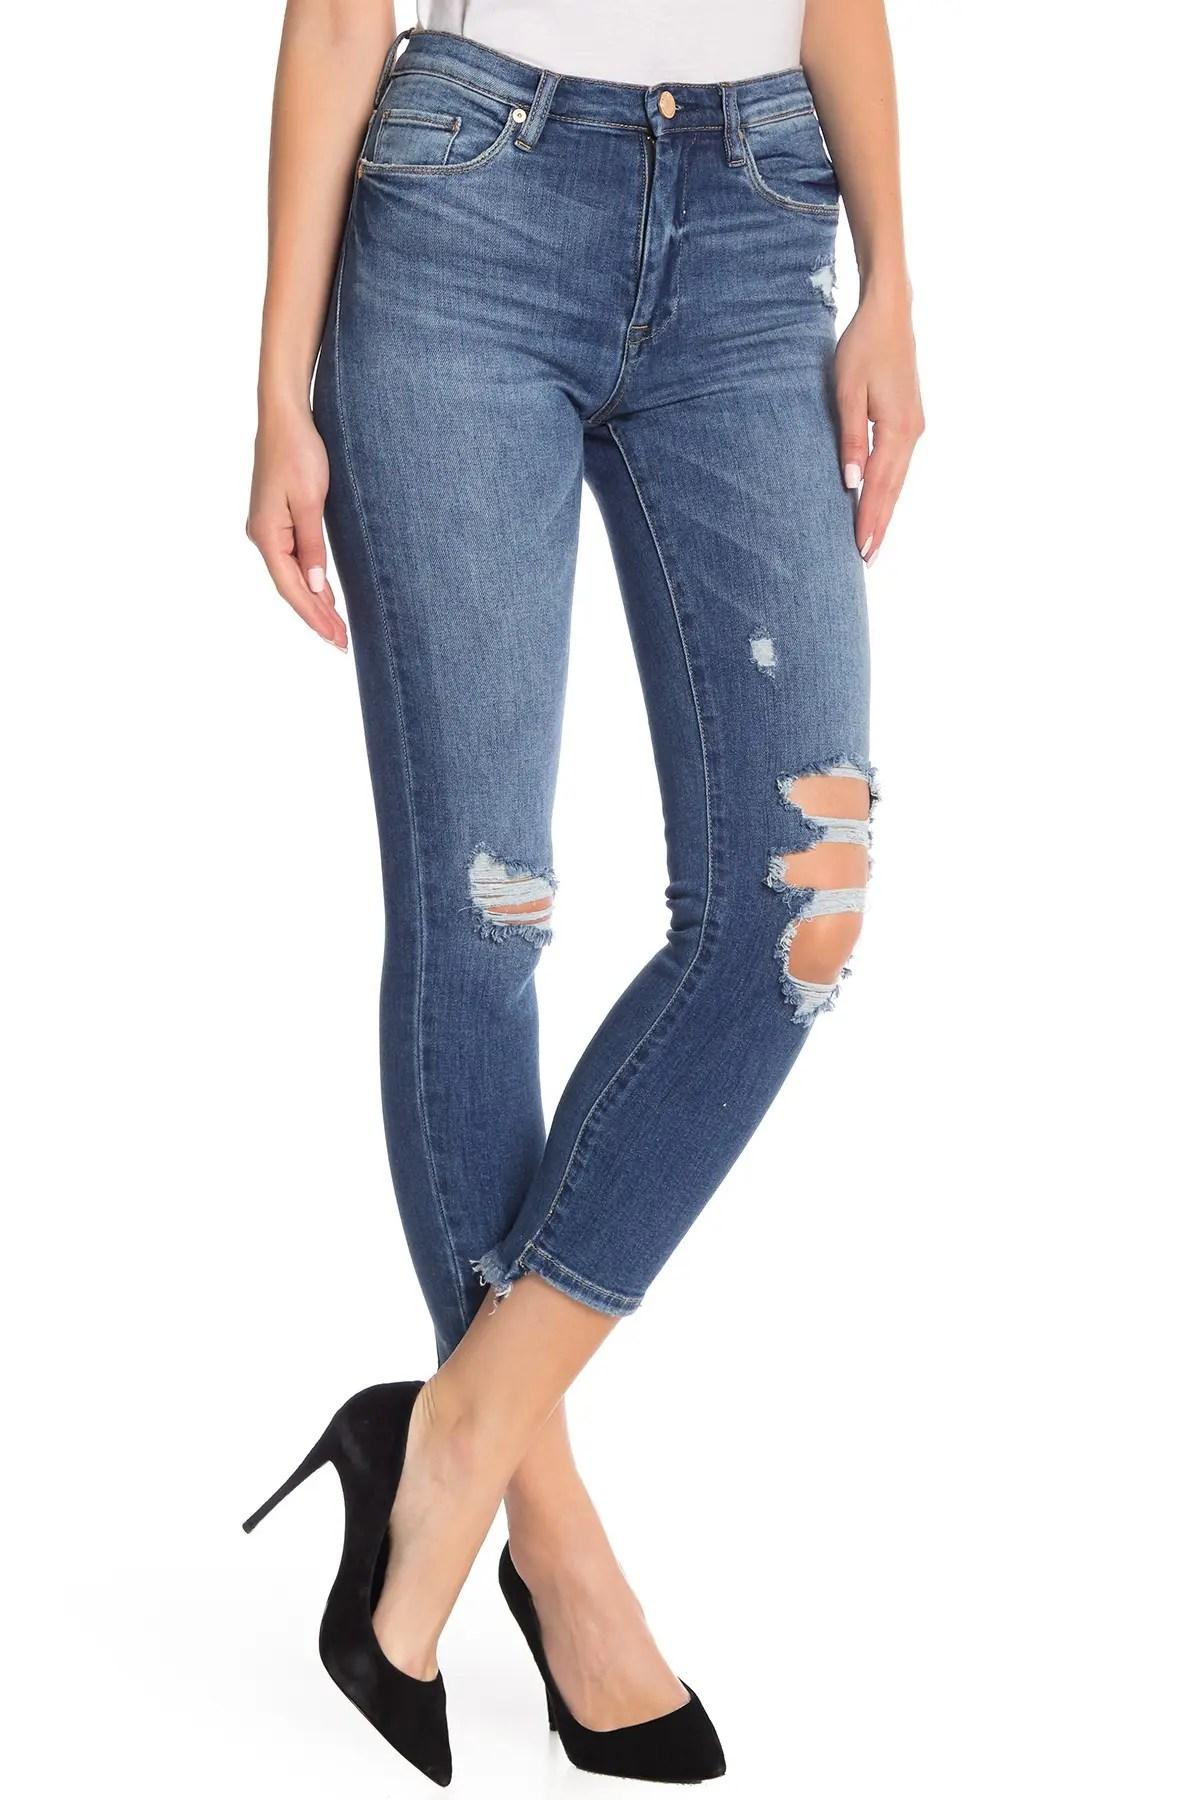 blanknyc denim the madison high rise crop jeans nordstrom rack